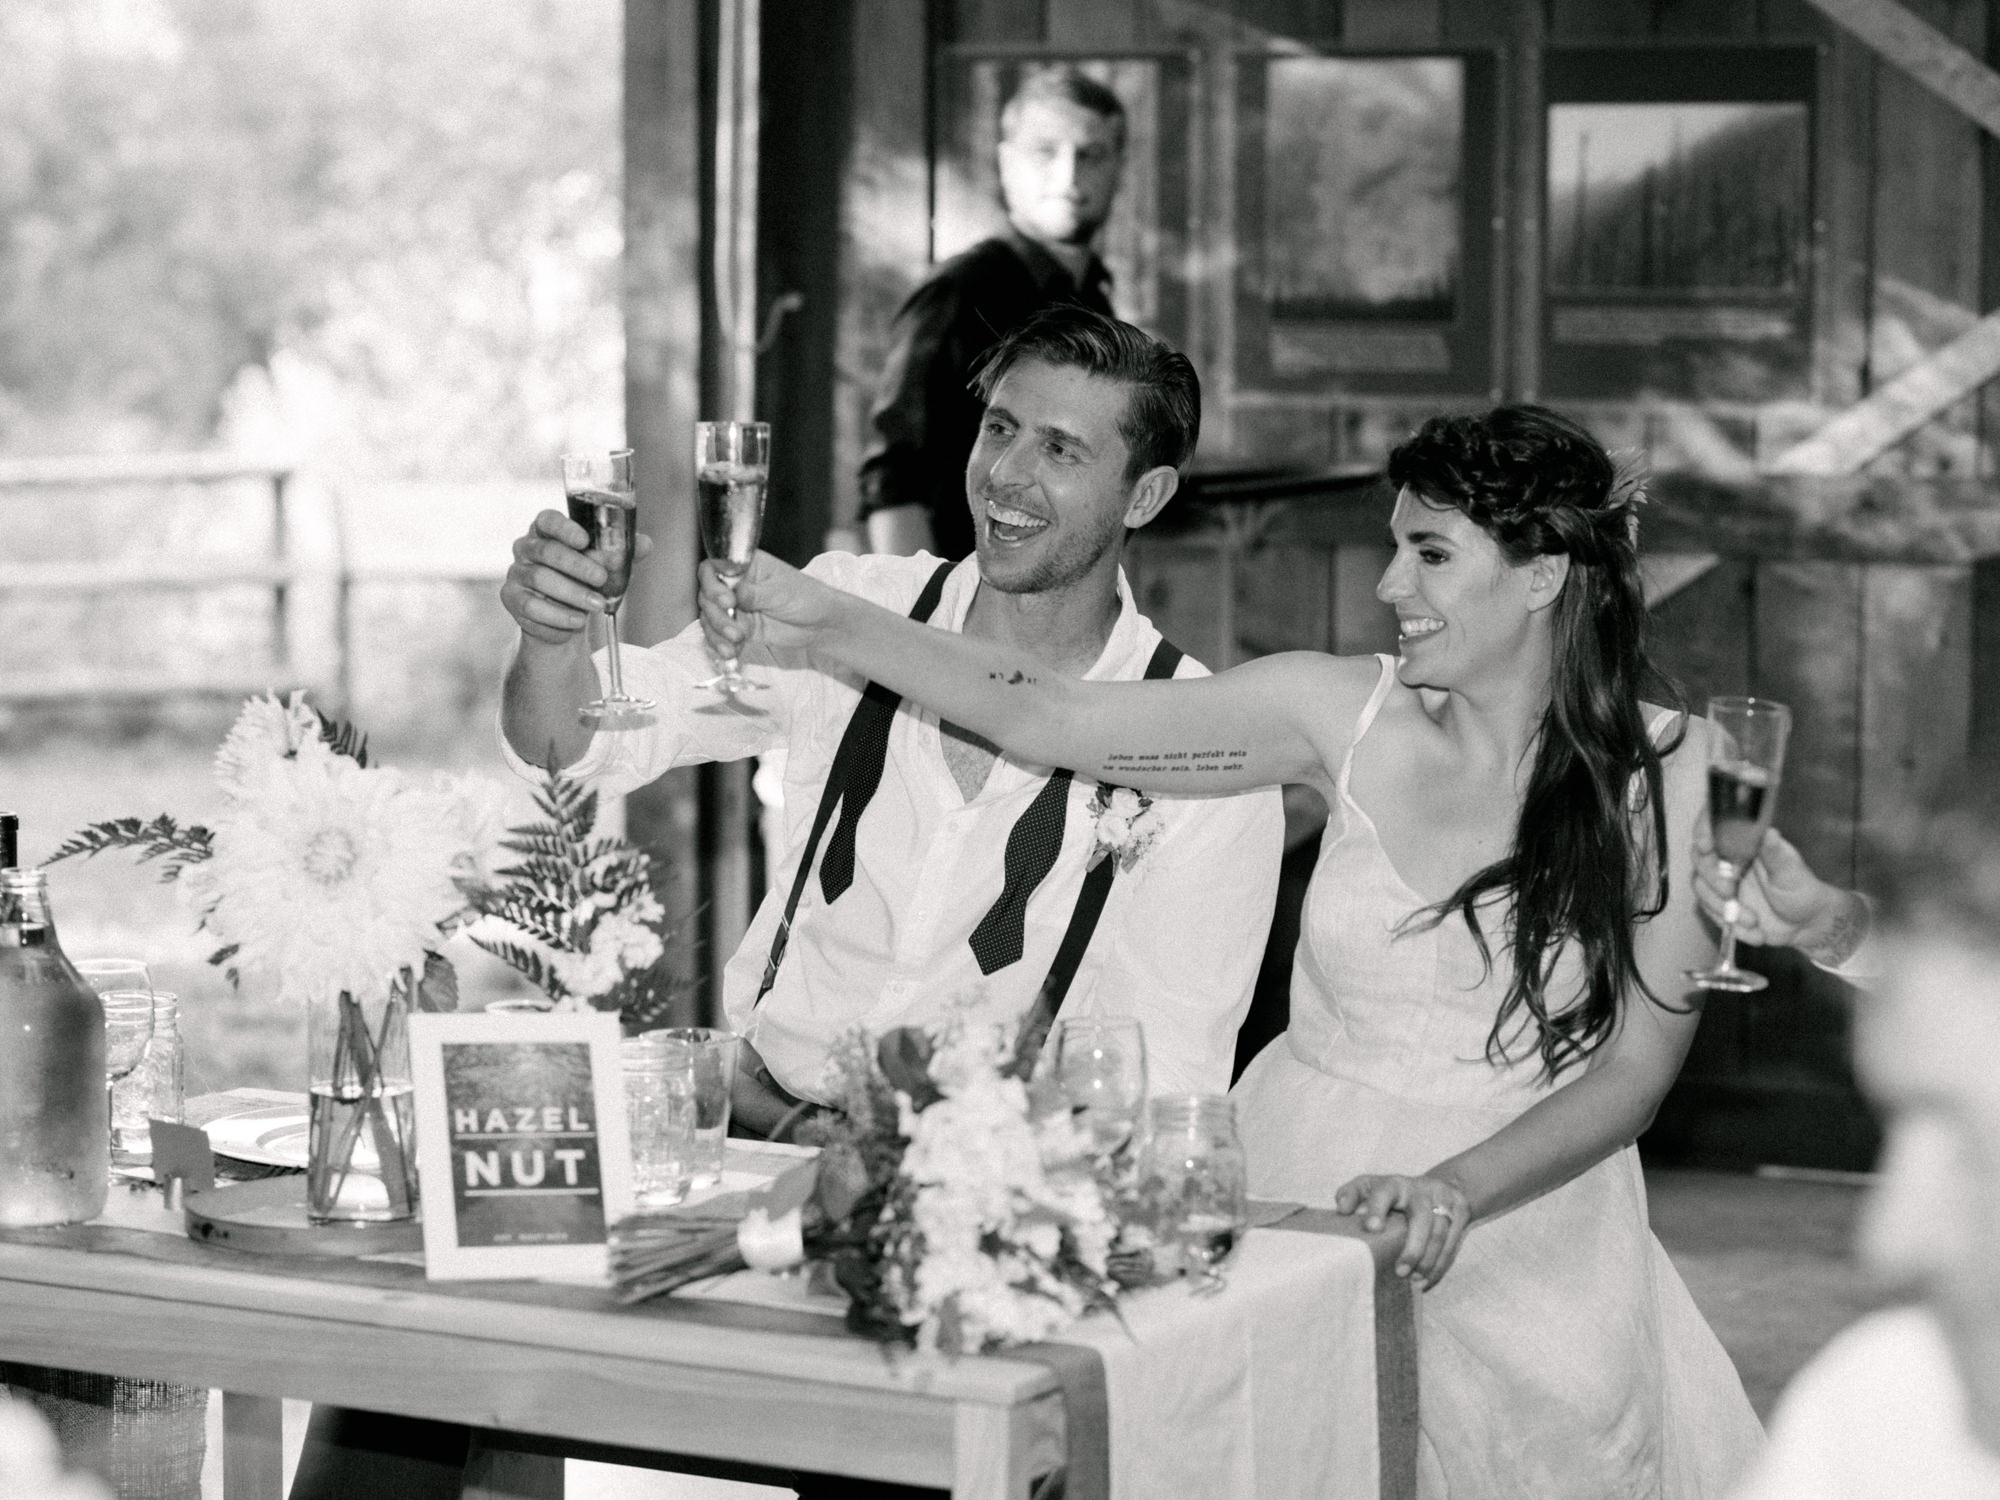 Brian Whitt Photography-Portland-Wedding-Photographer-BMW-141226-untitled-0301.jpg